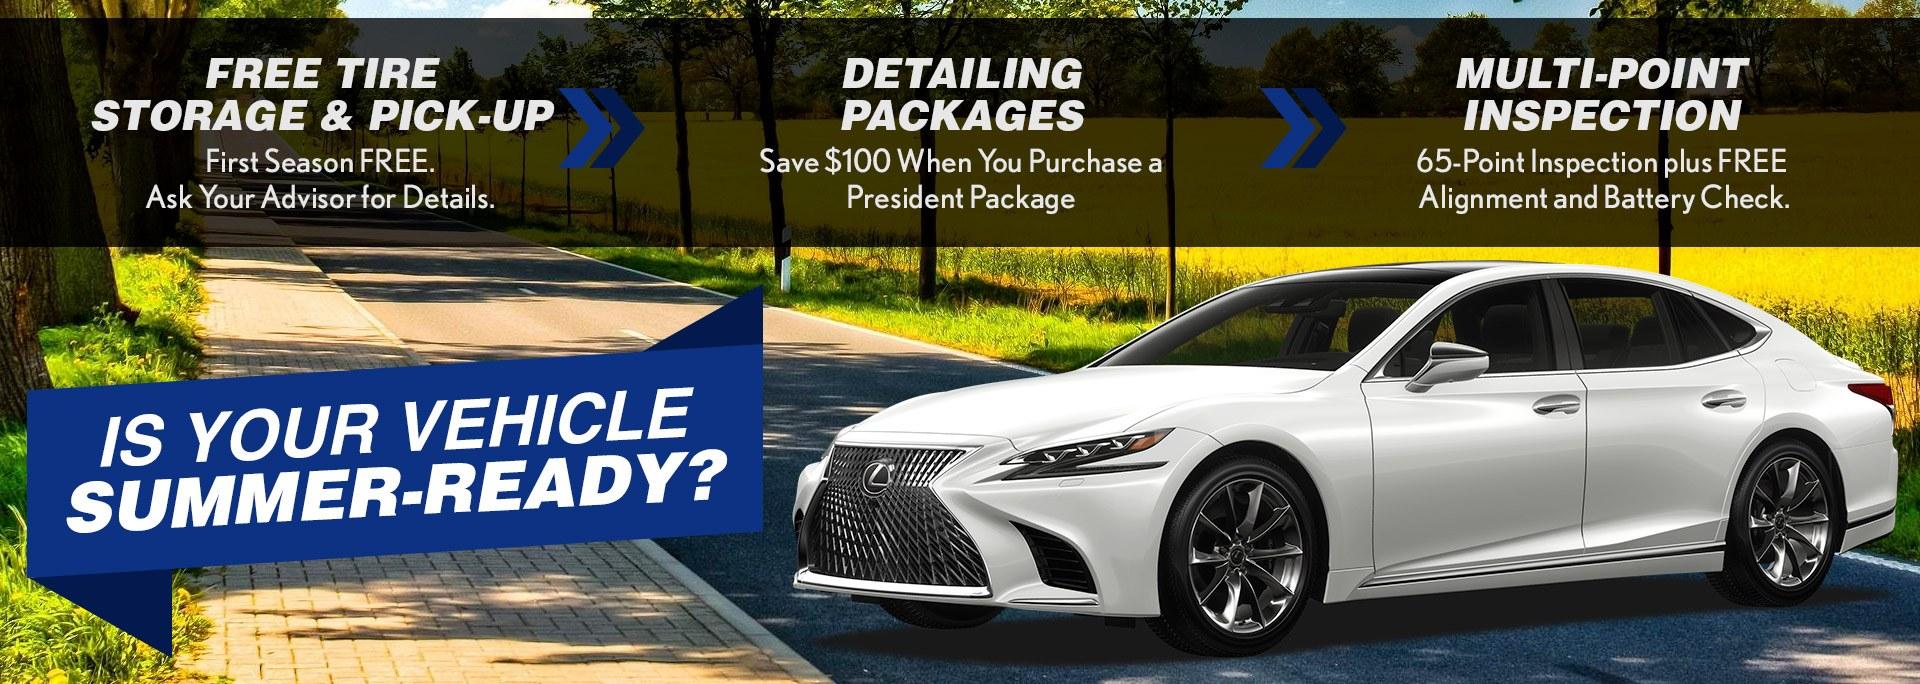 Lexus Service Specials Promotions